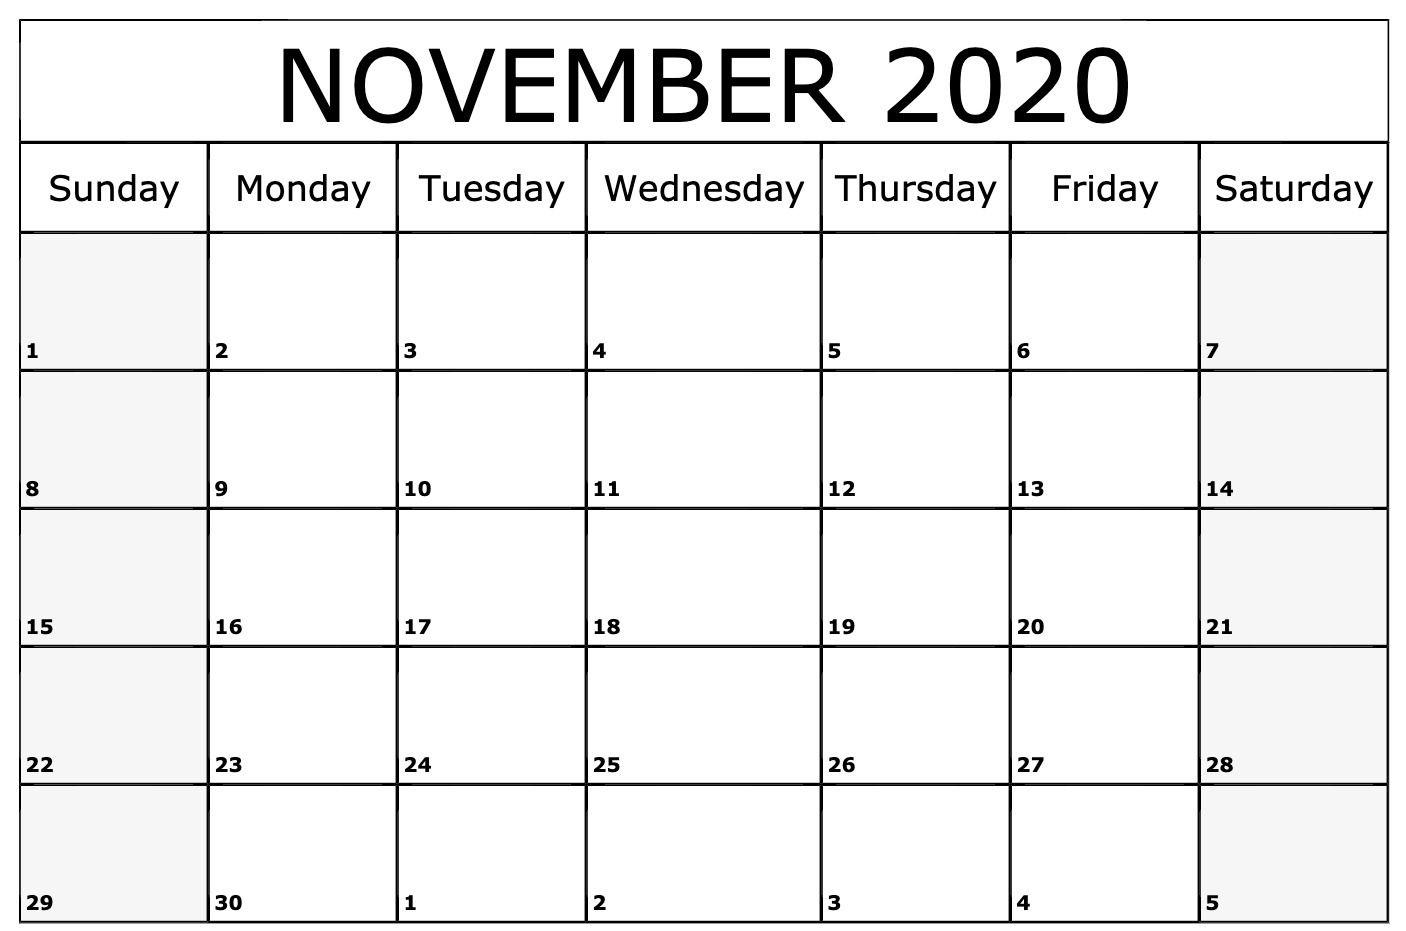 November 2020 Calendar Printable Template | July Calendar